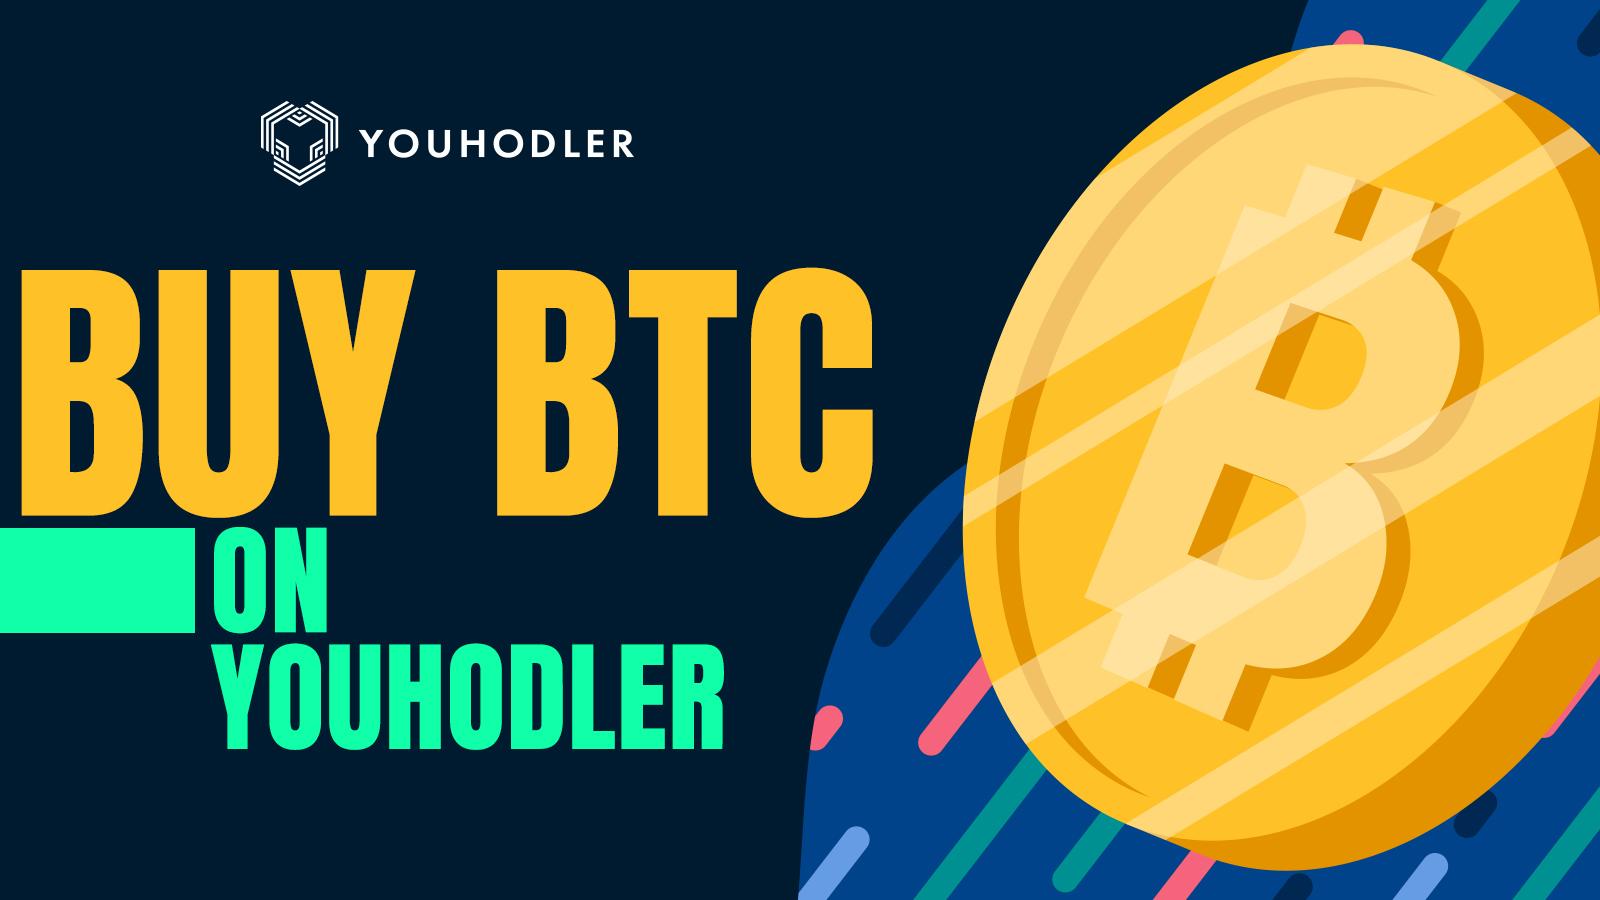 buy btc, buy crypto with credit card, buy bitcoin, buy crypto, exchange crypto